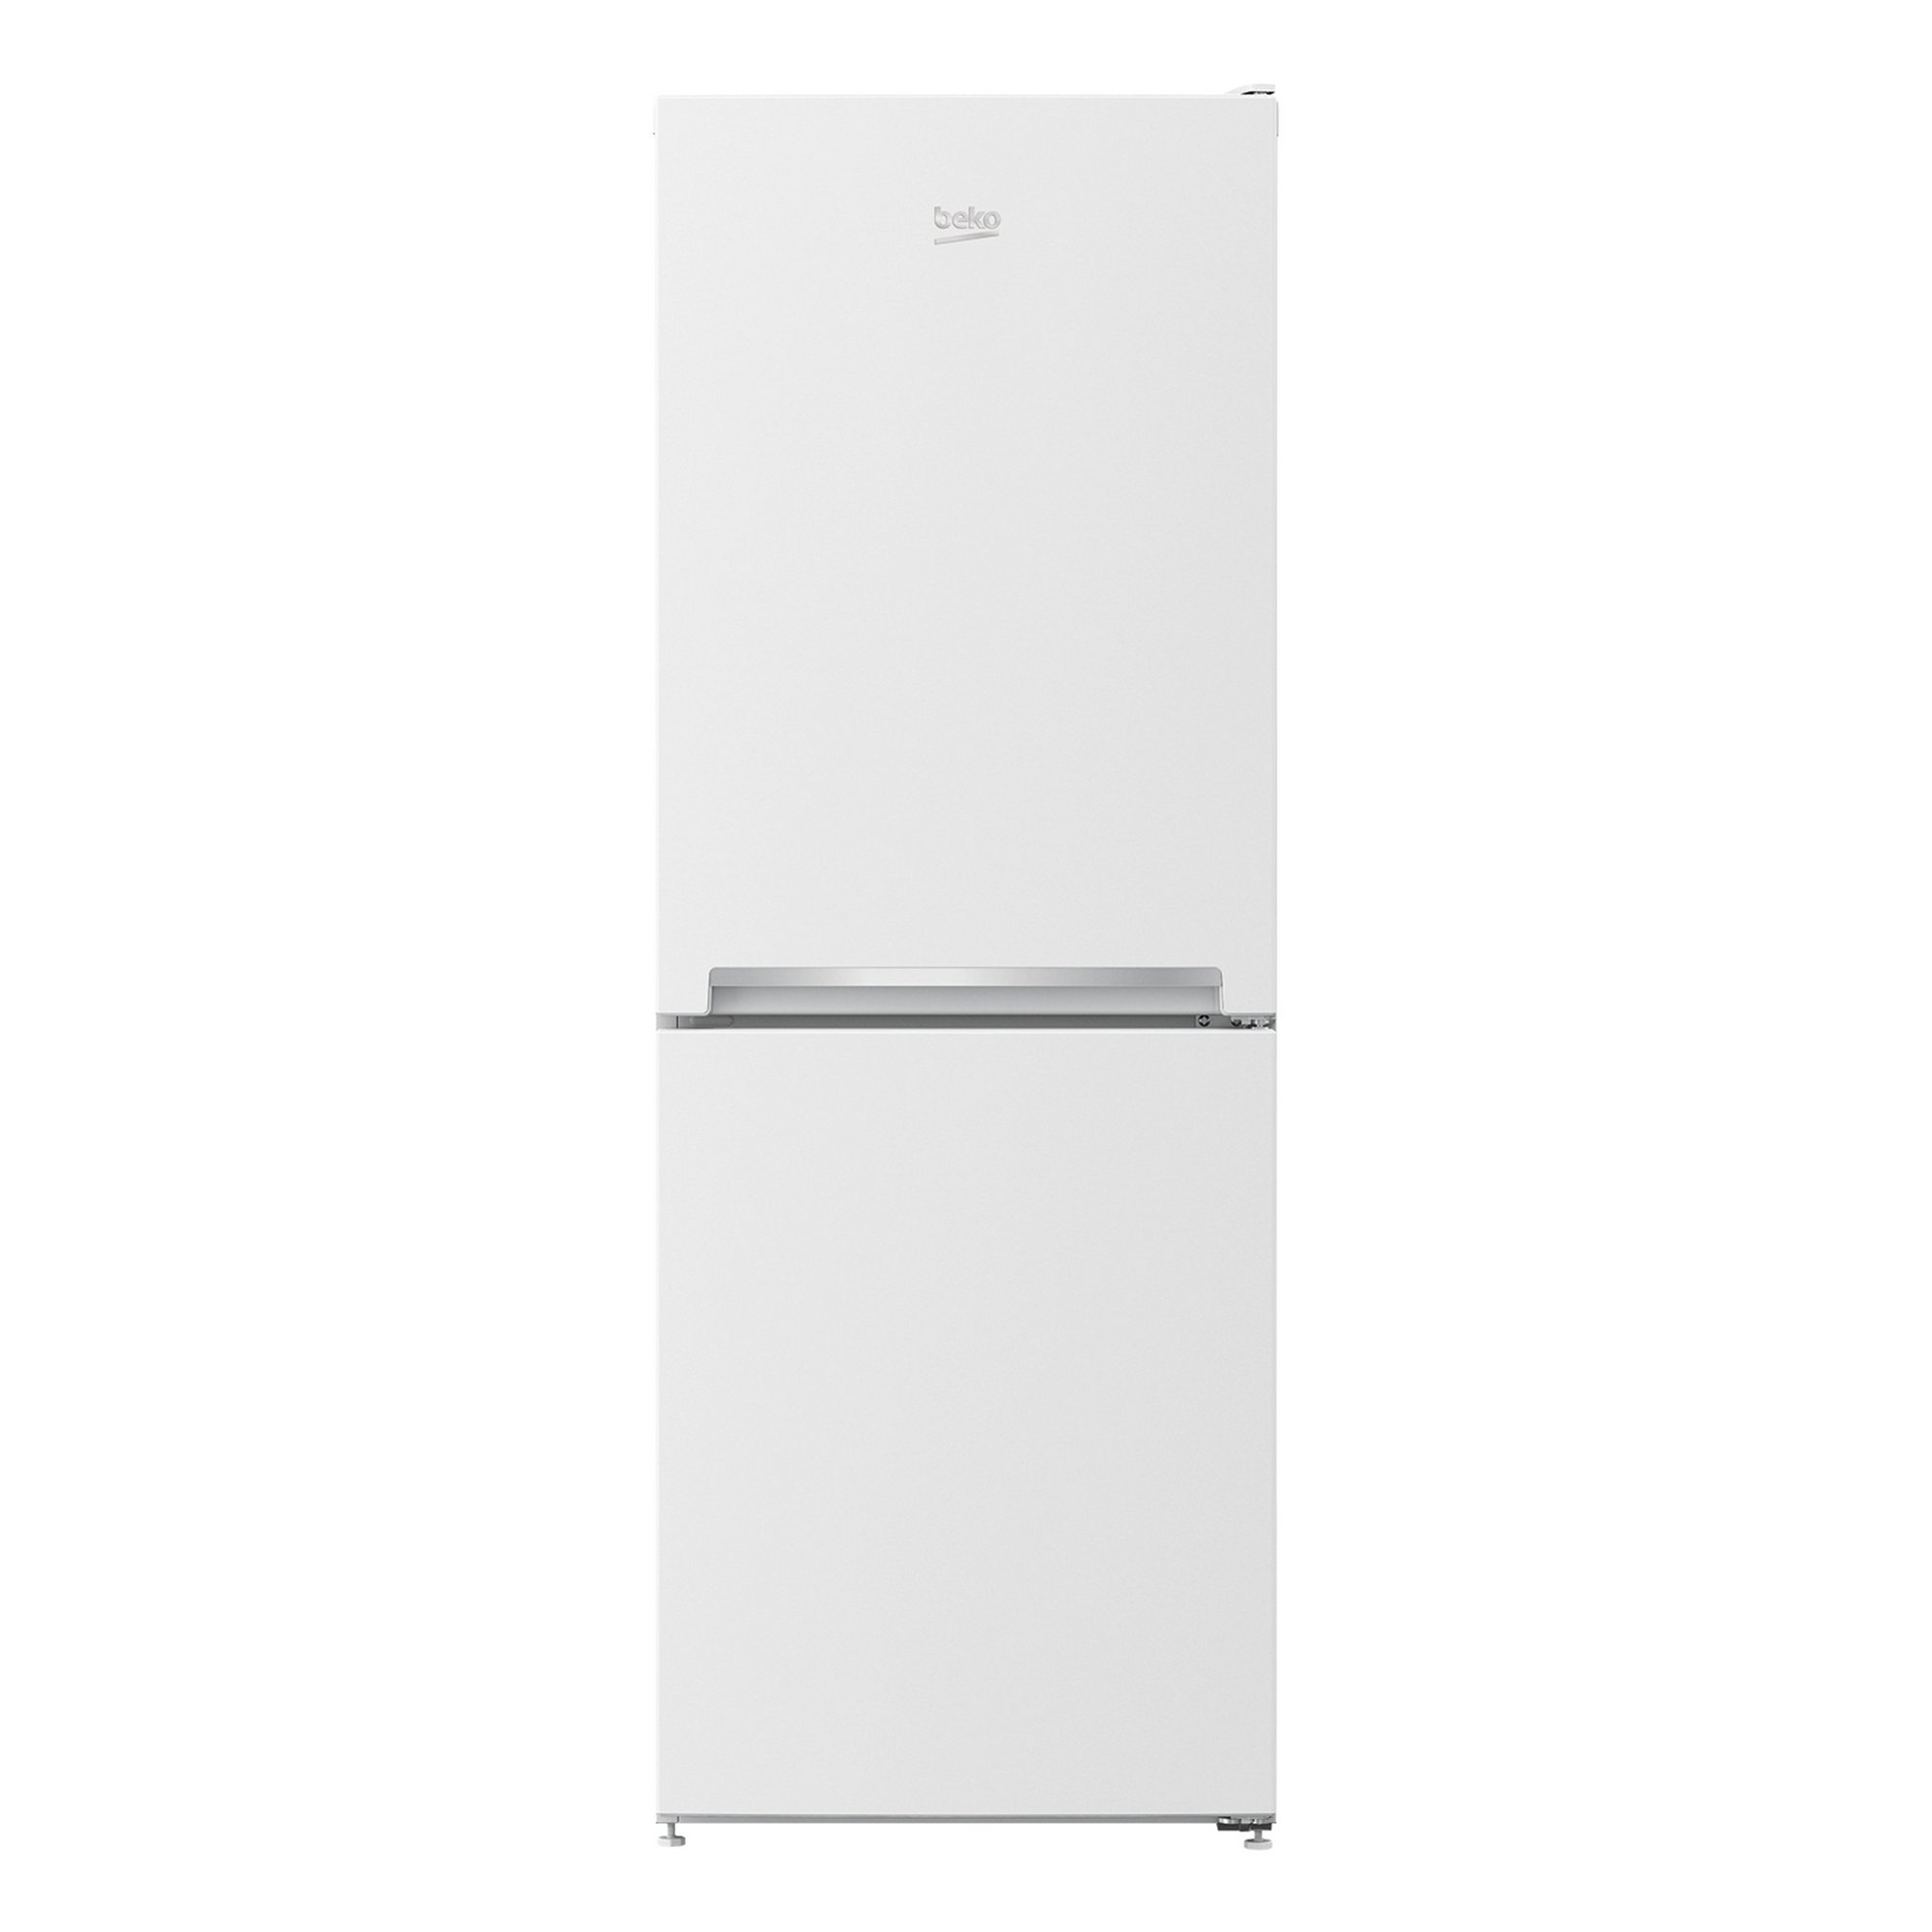 Image of Beko 152/54cm Frost Free Fridge Freezer